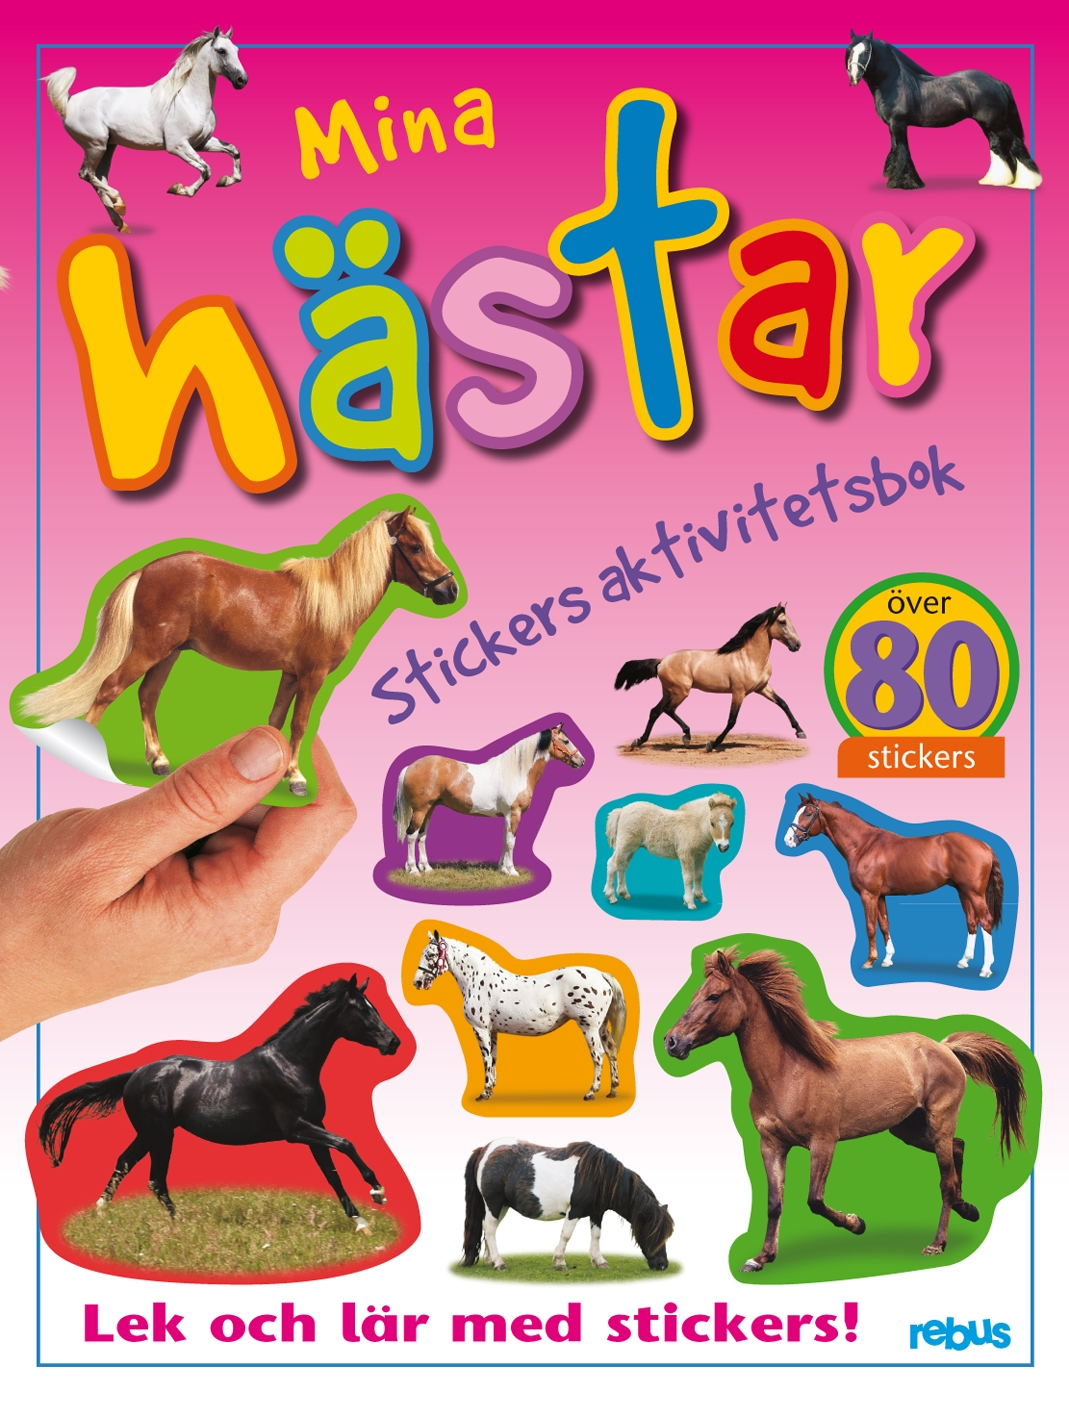 Mina hästar stickers aktivitetsbok